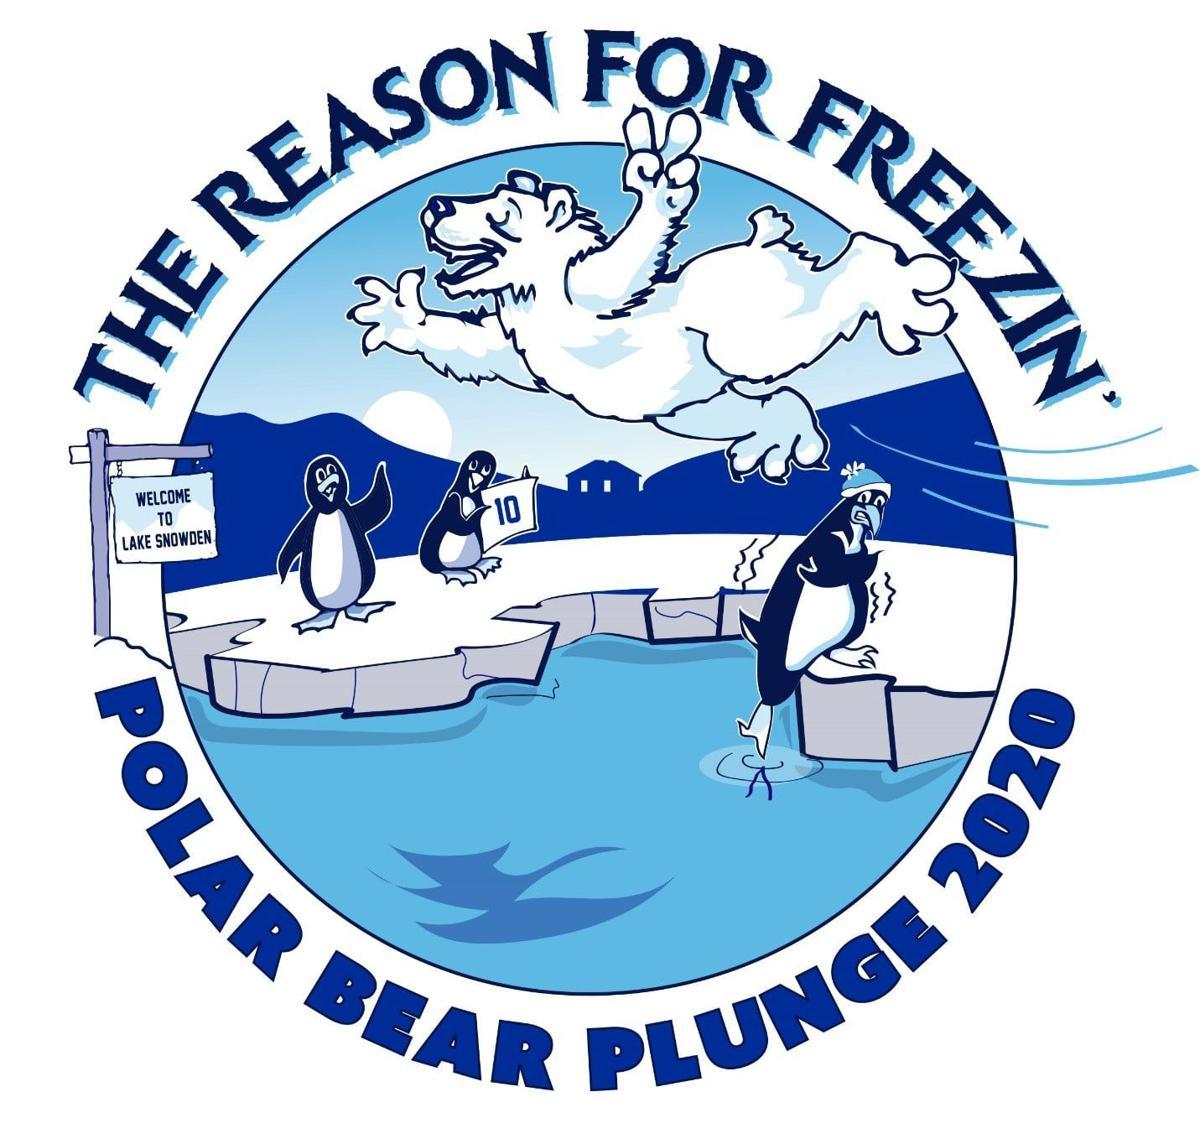 Polar Bear Plunge T-shirt